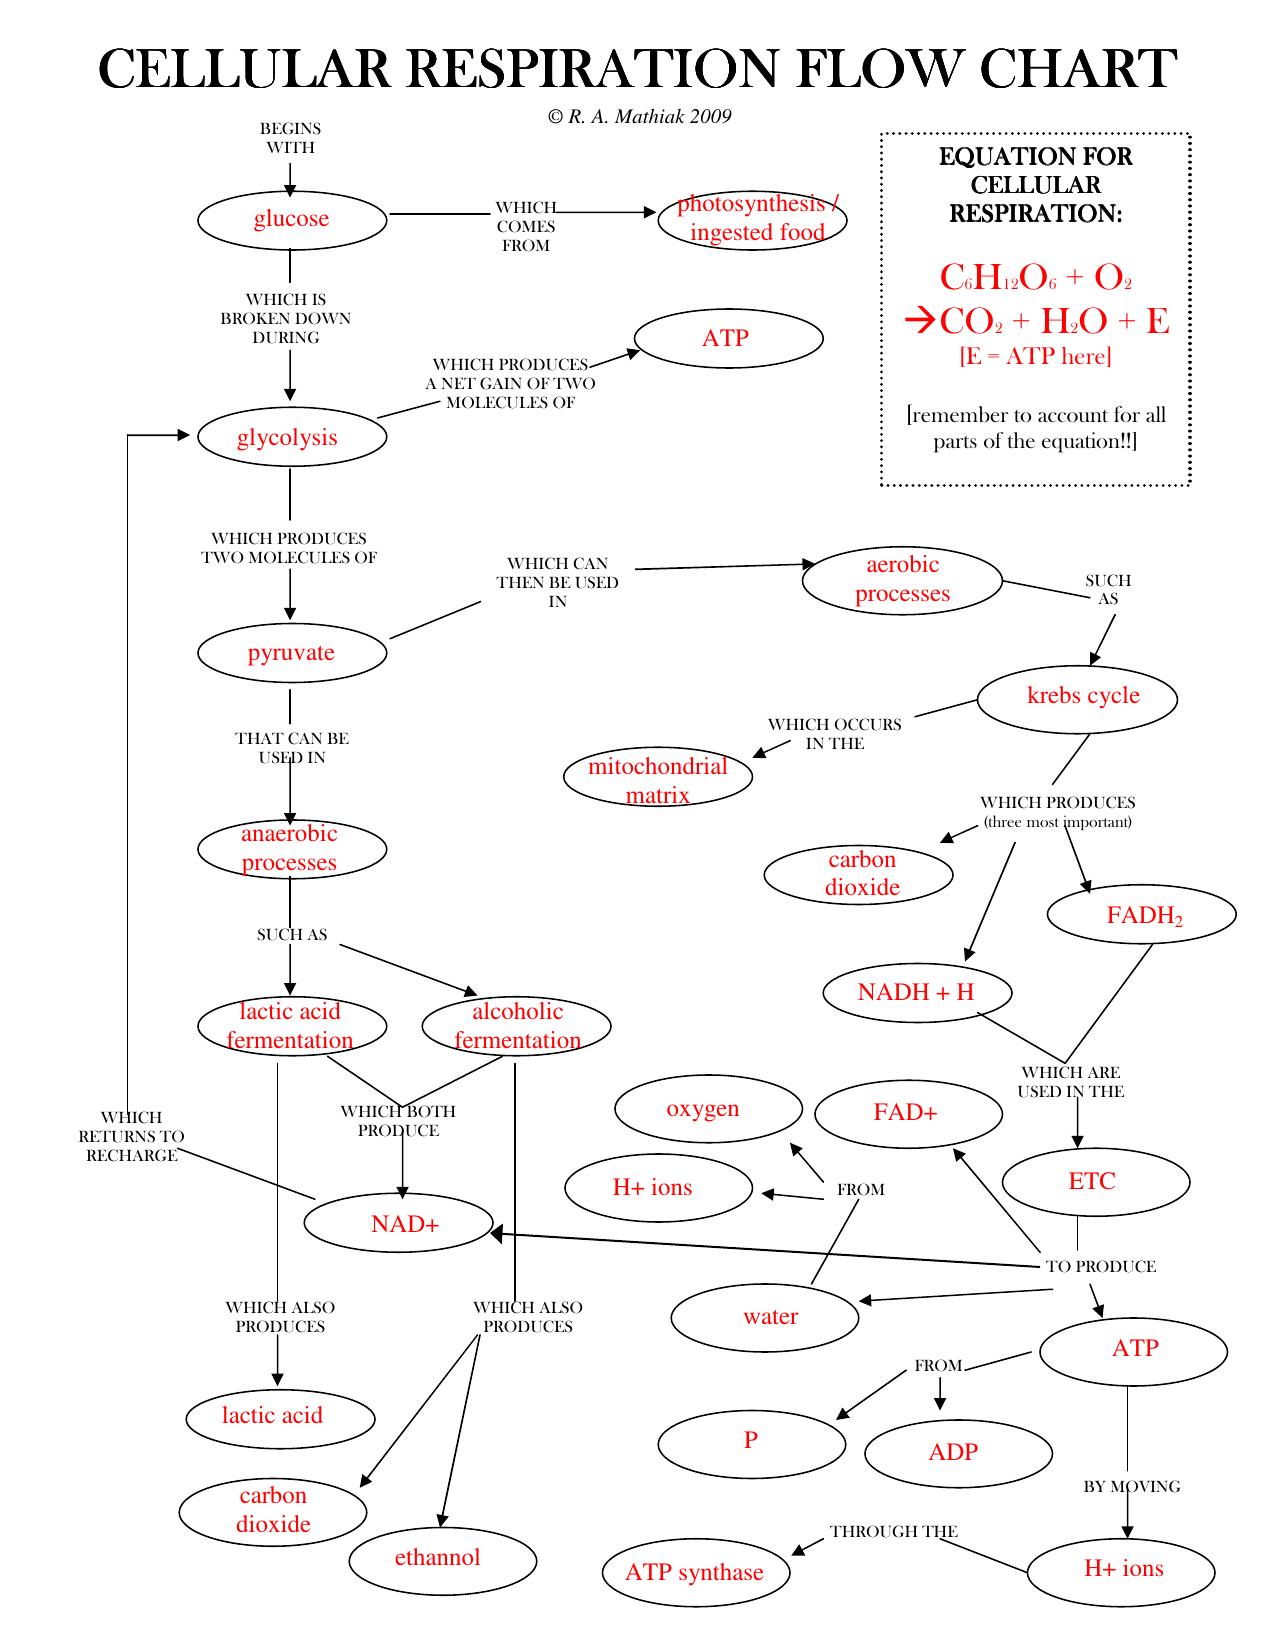 Cellular Respiration Flow Chart Worksheet Promotiontablecovers